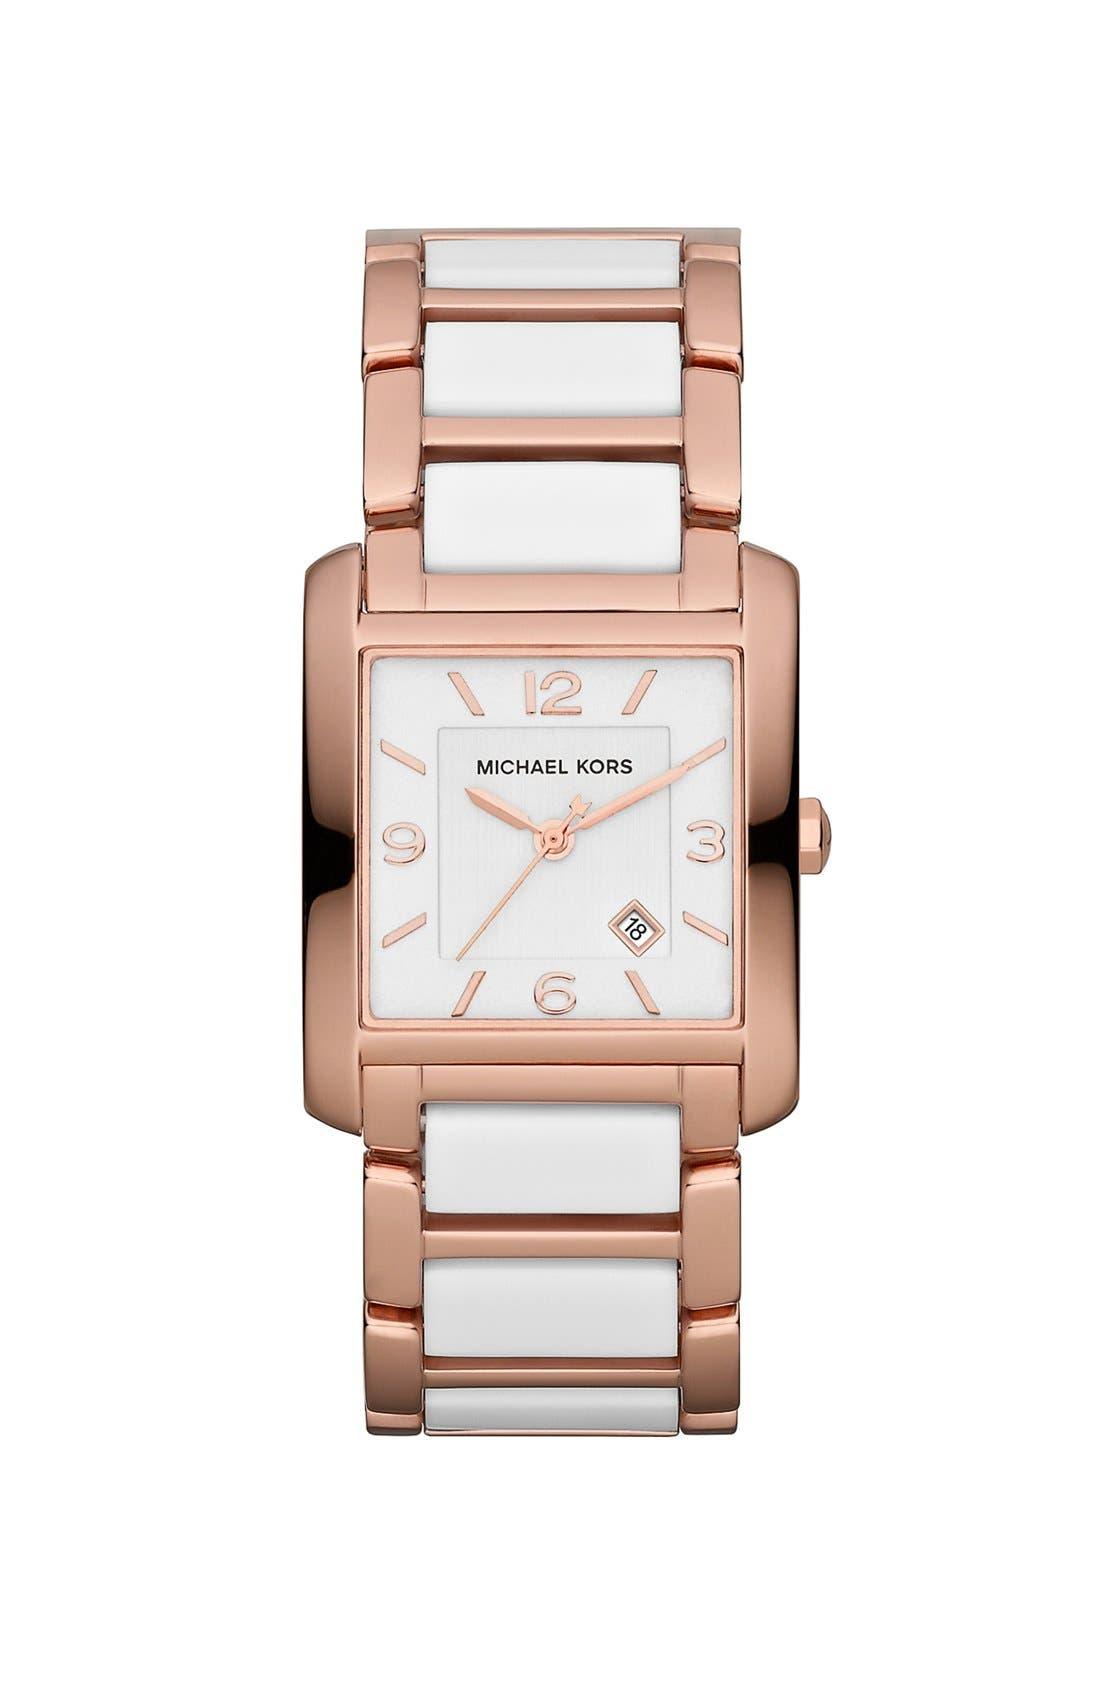 Main Image - Michael Kors 'Frenchy' Rectangular Bracelet Watch, 26mm x 29mm